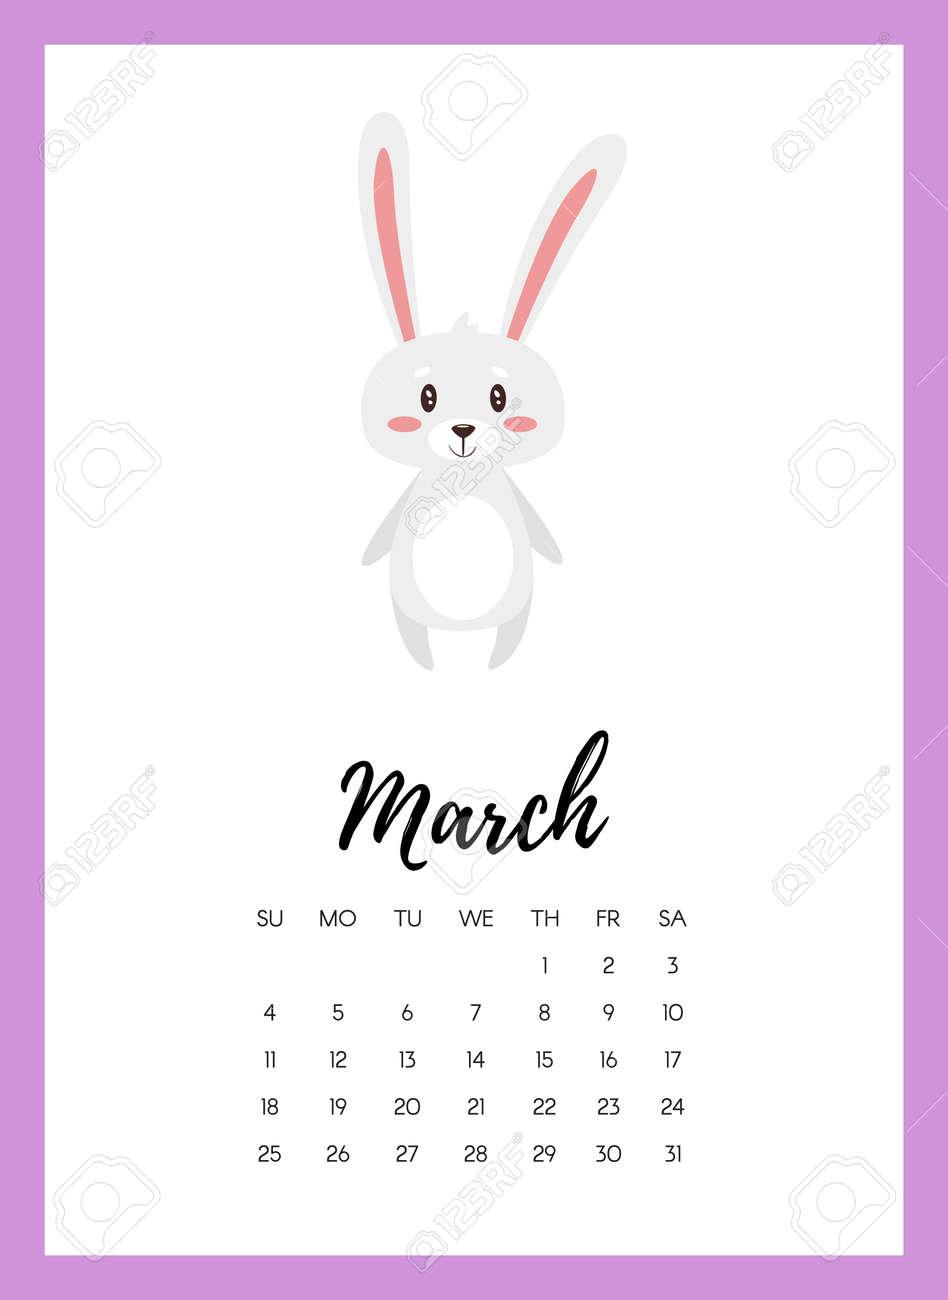 Vector Cartoon Style Illustration Of March 2018 Year Calendar